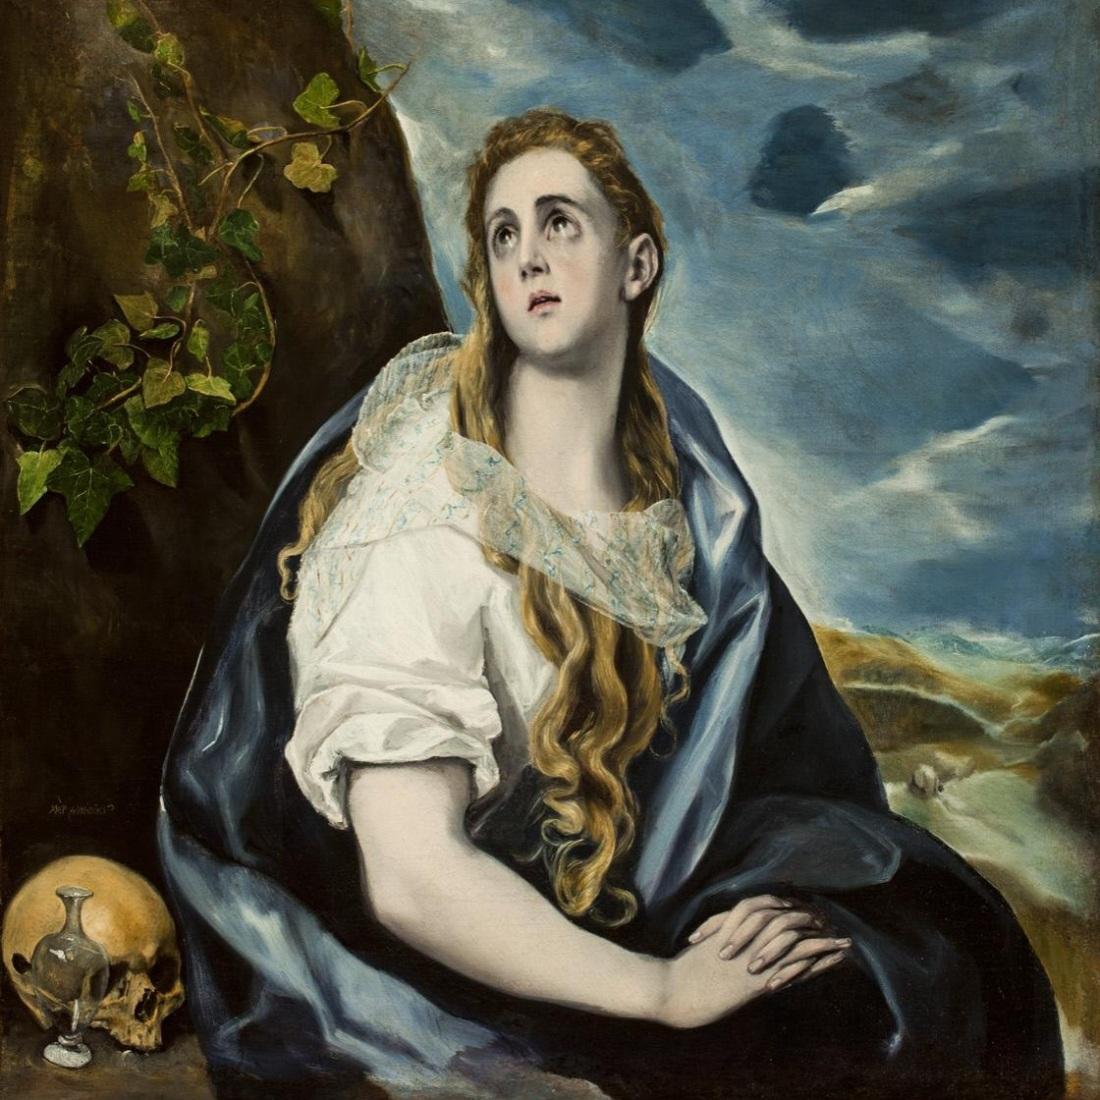 El Greco, The Penitent Magdalene.